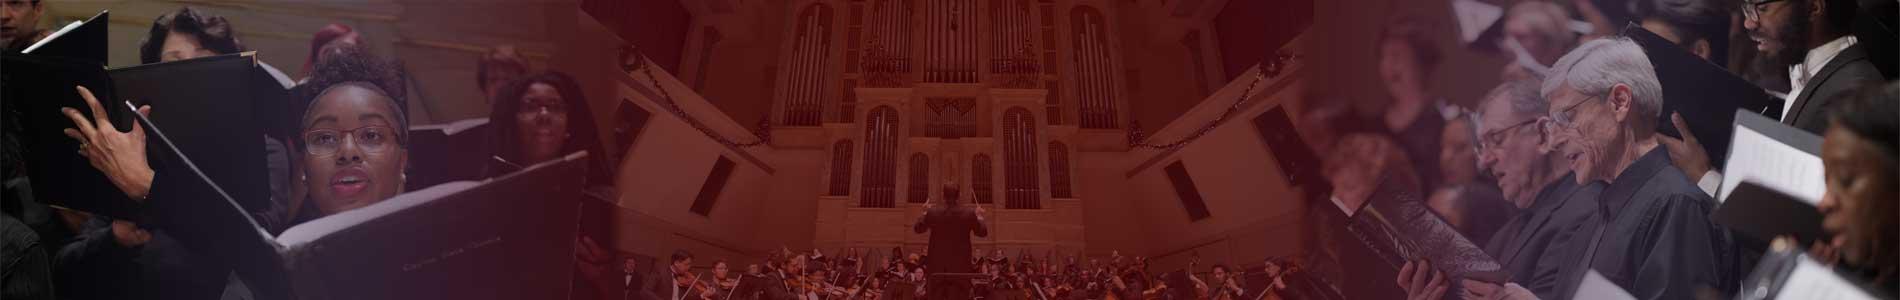 Masterworks Chorus banner image